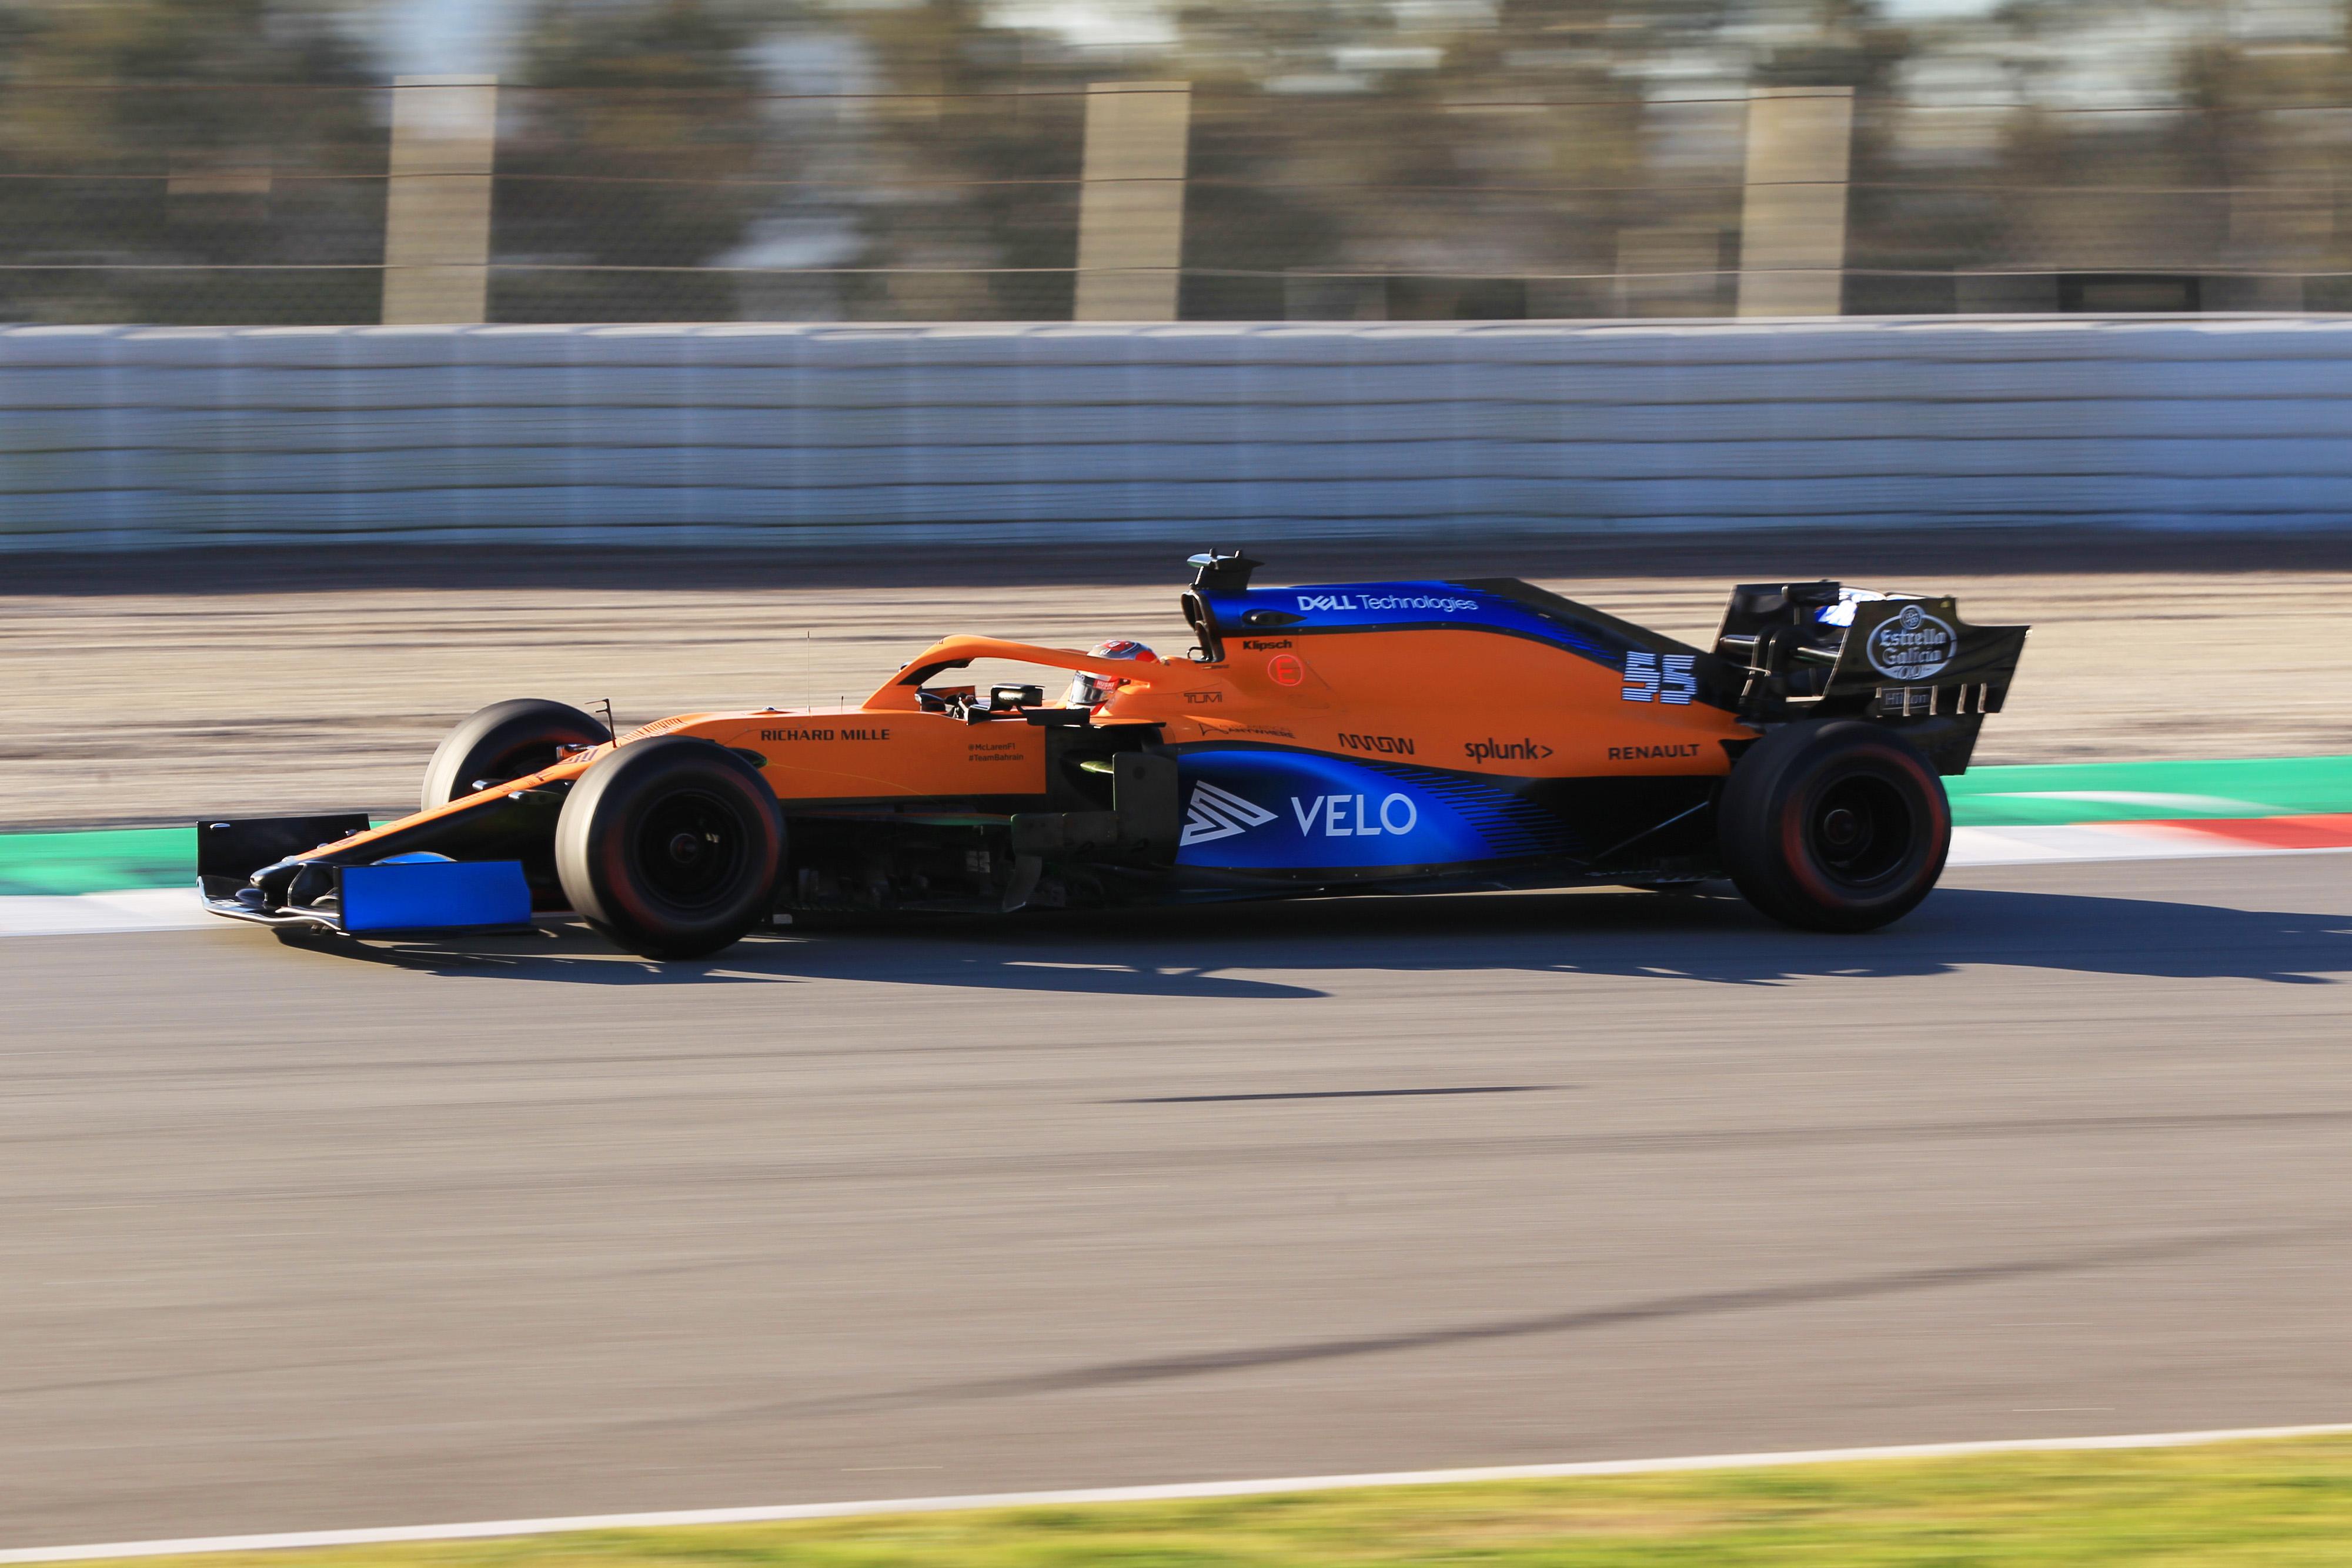 F1 Formula 1 Carlos Sainz McLaren Testing